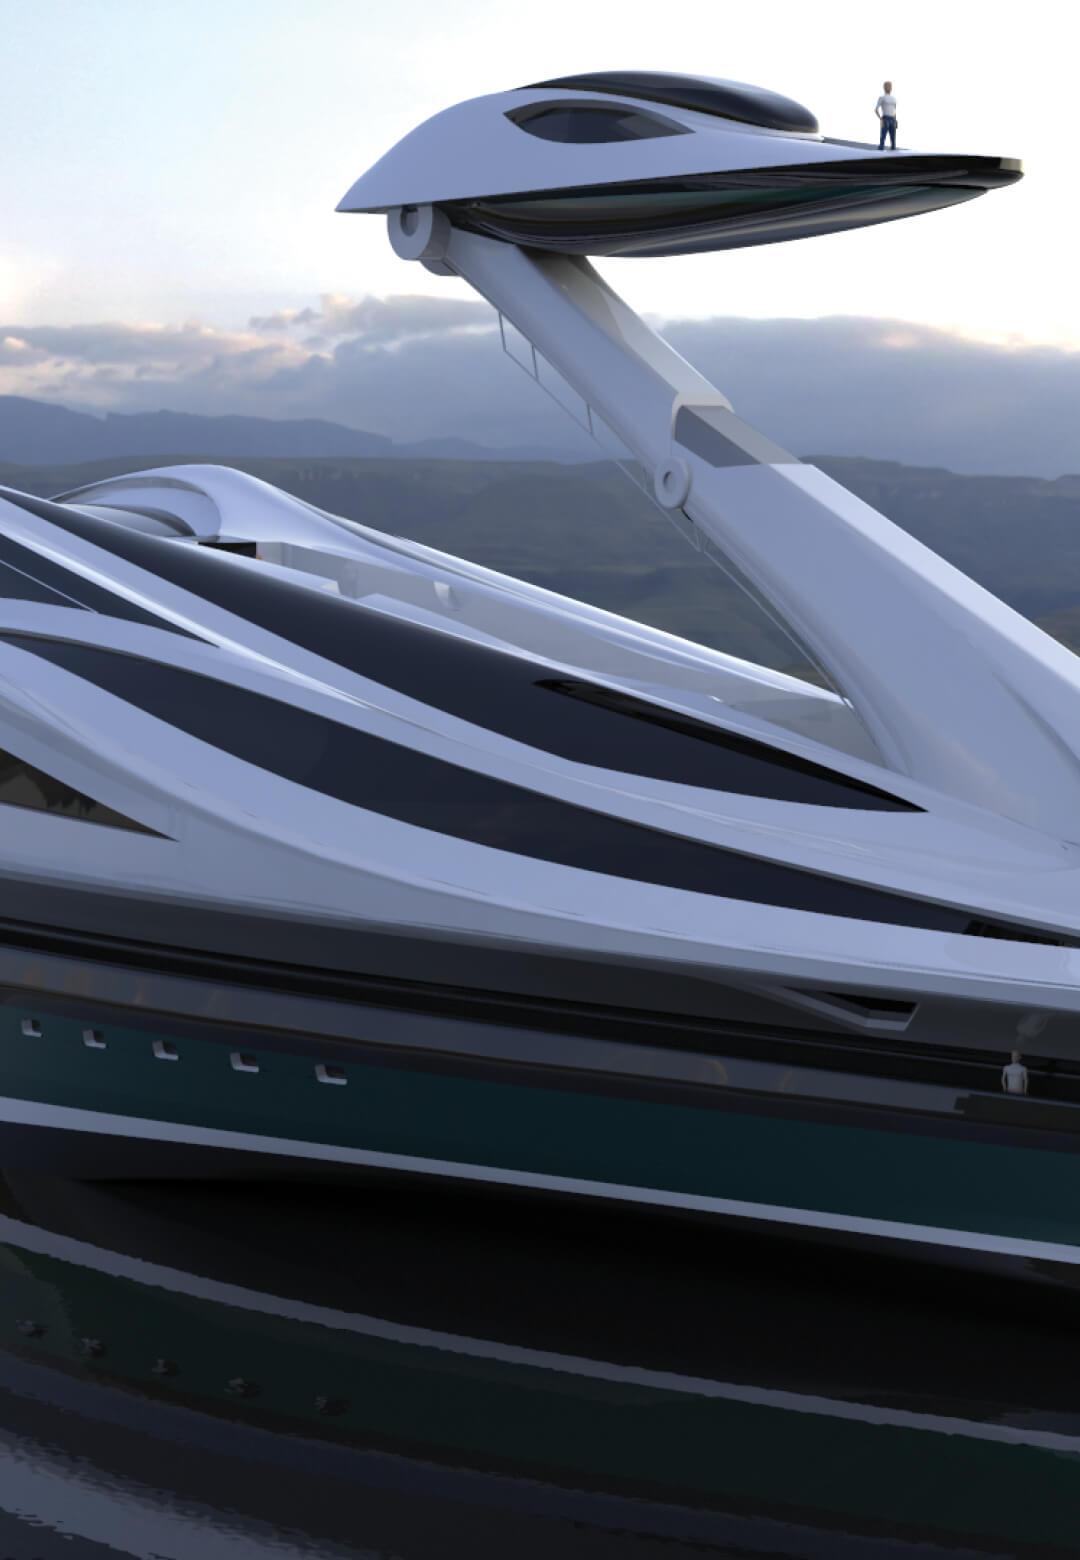 Avanguardia is a cutting-edge design for a 137-metre mega yacht | Avanguardia by Lazzarini Design Studio | STIRworld